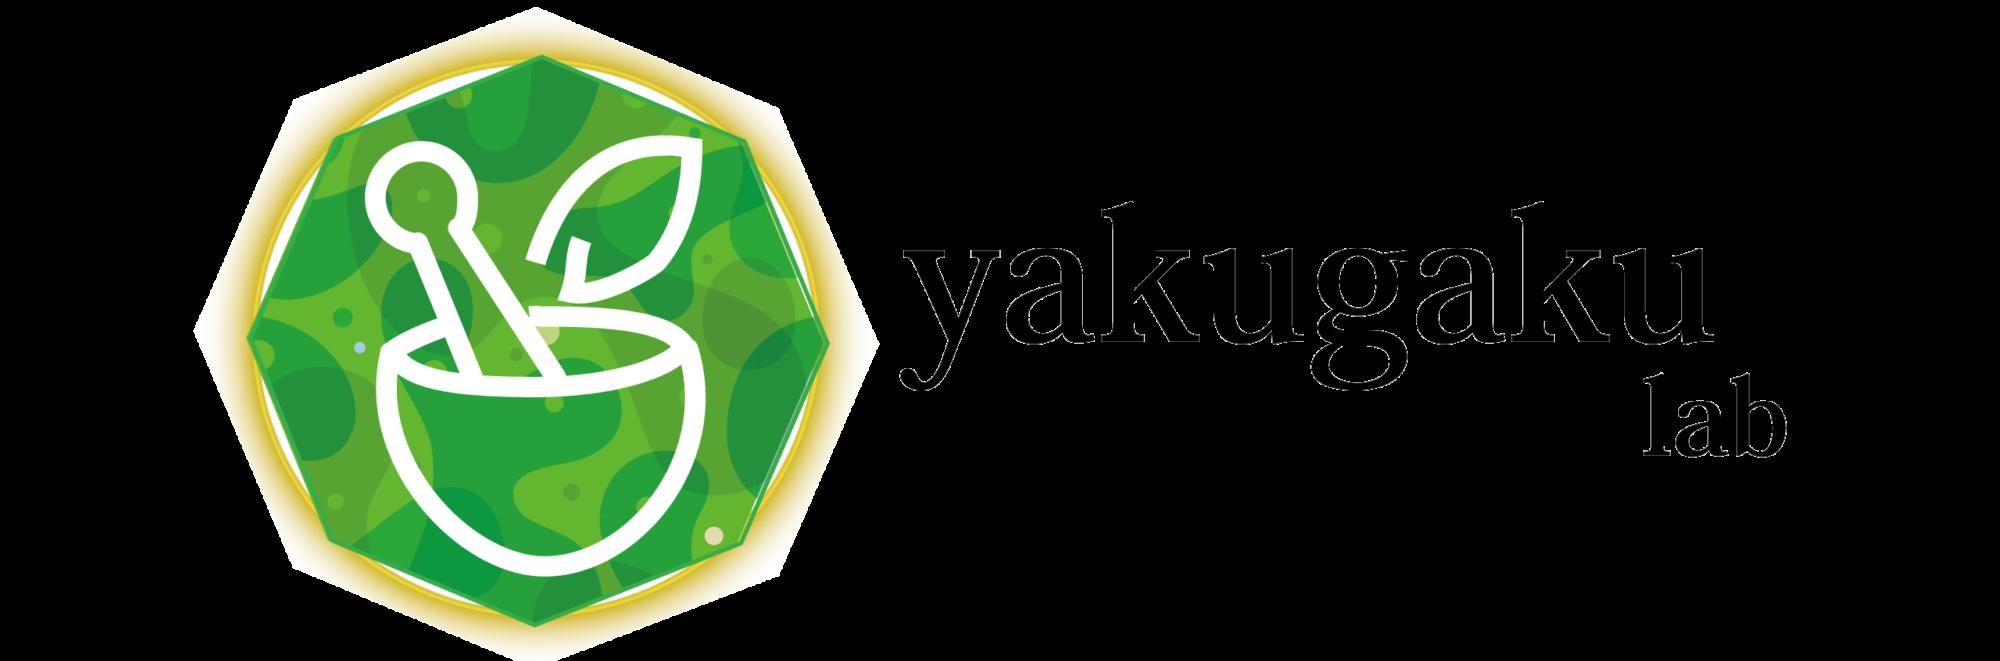 yakugaku lab(薬剤師国家試験対策、薬剤師国家試験解説、医薬品関連情報)